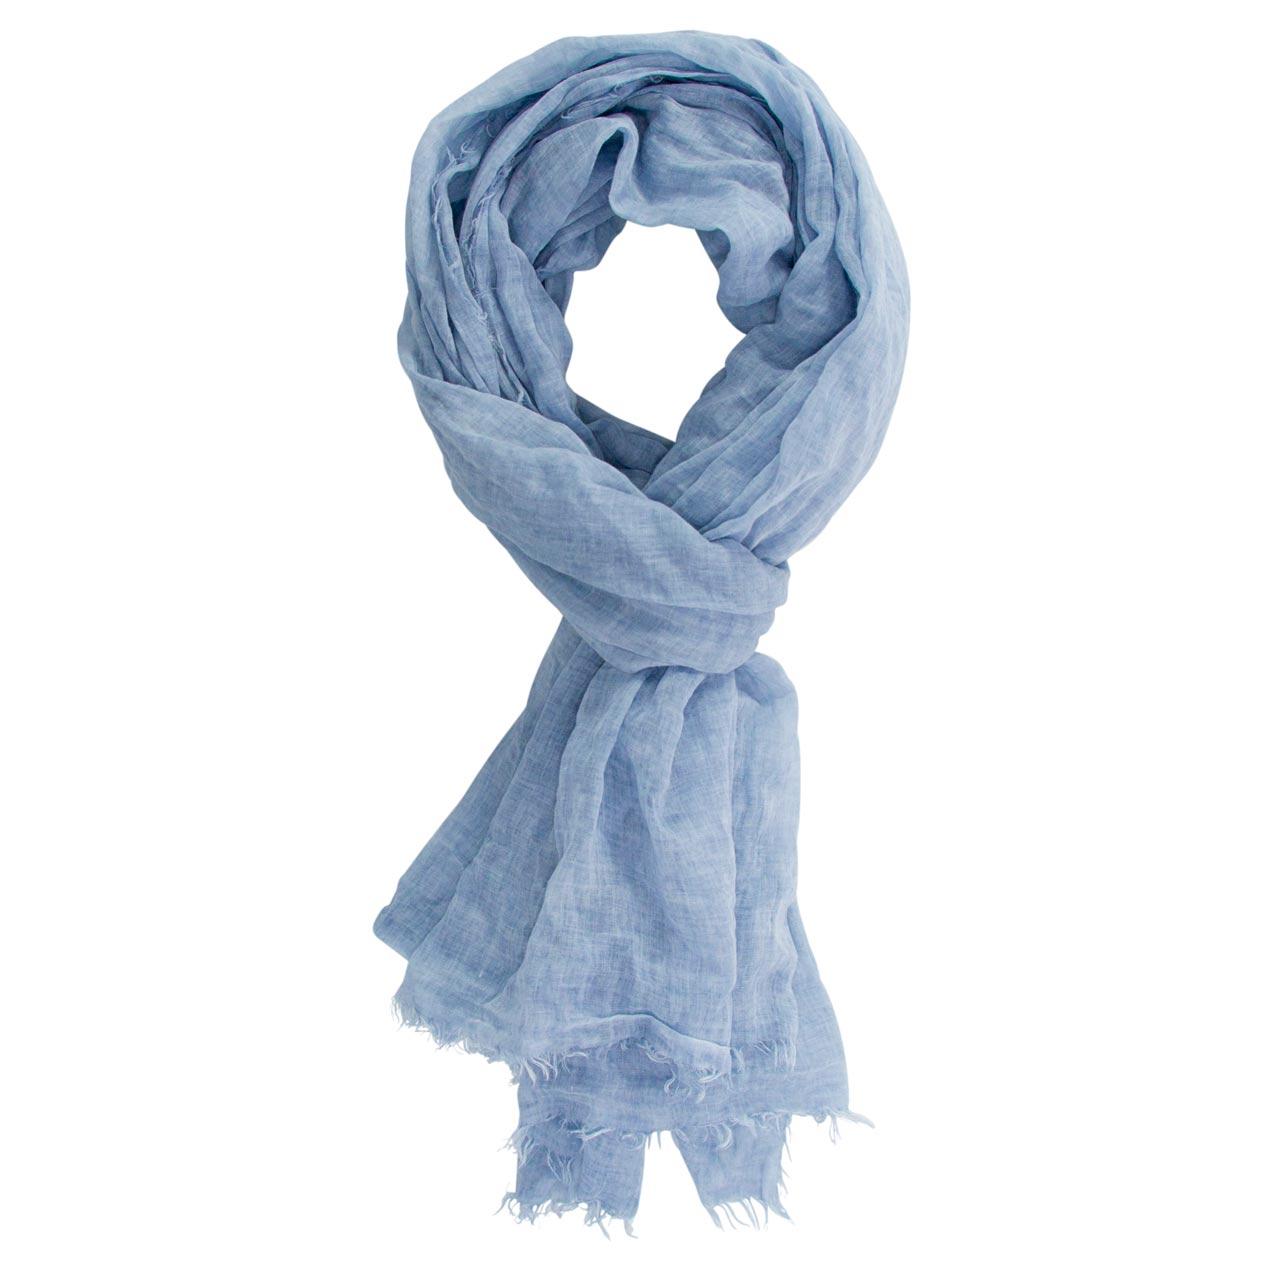 Cotton Scarf Pastel Blue | The Design Gift Shop